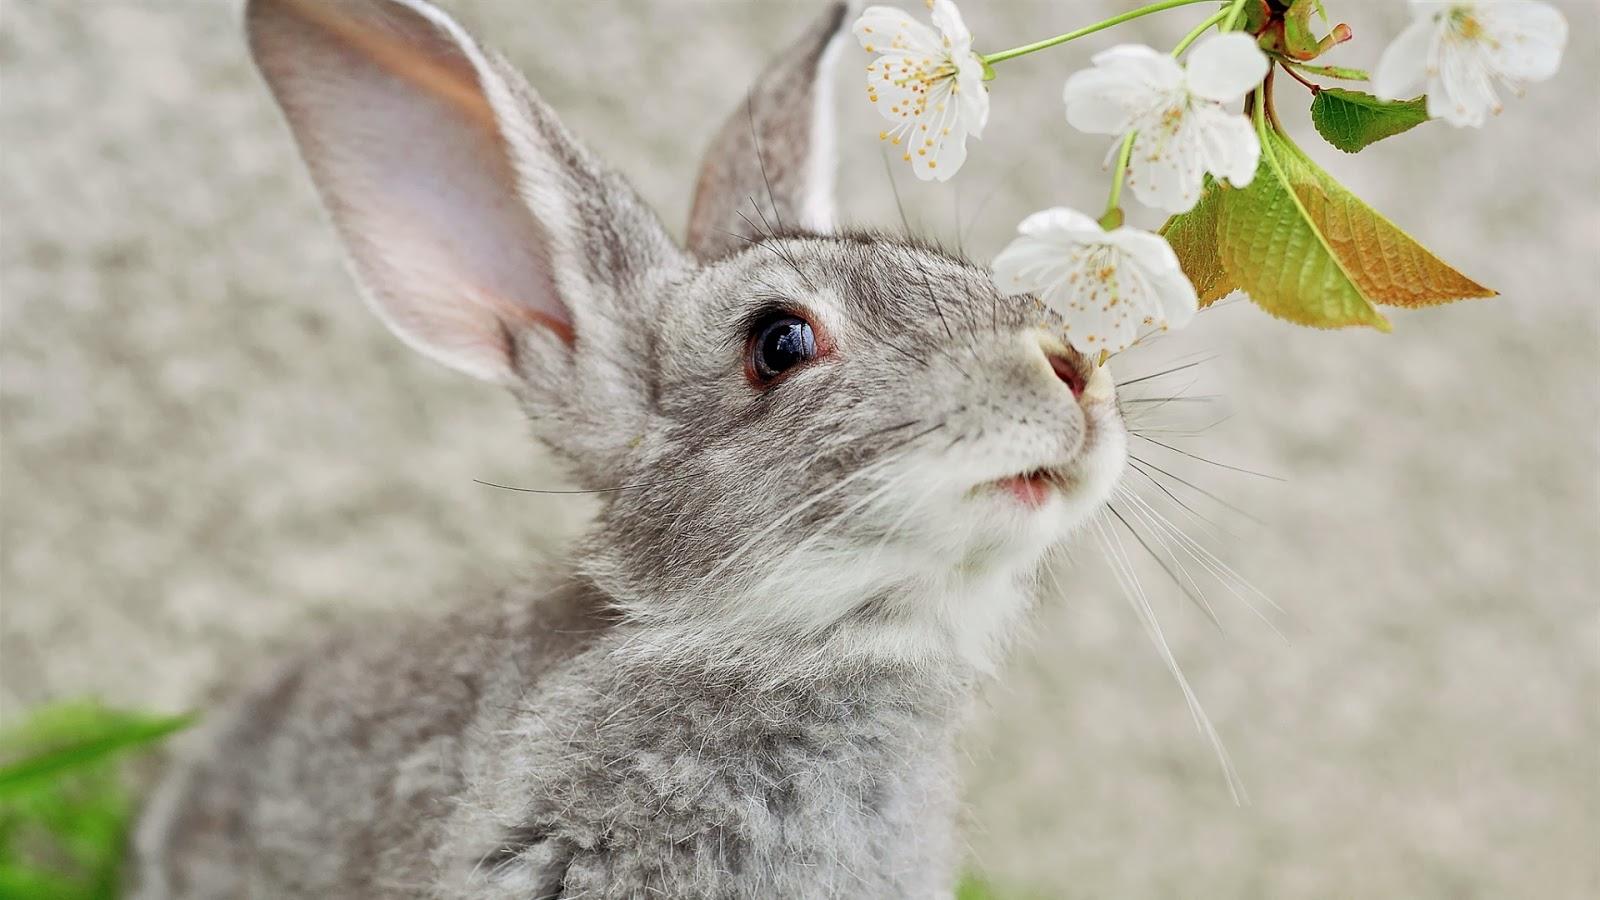 rabbit wallpaper for desktop - photo #22